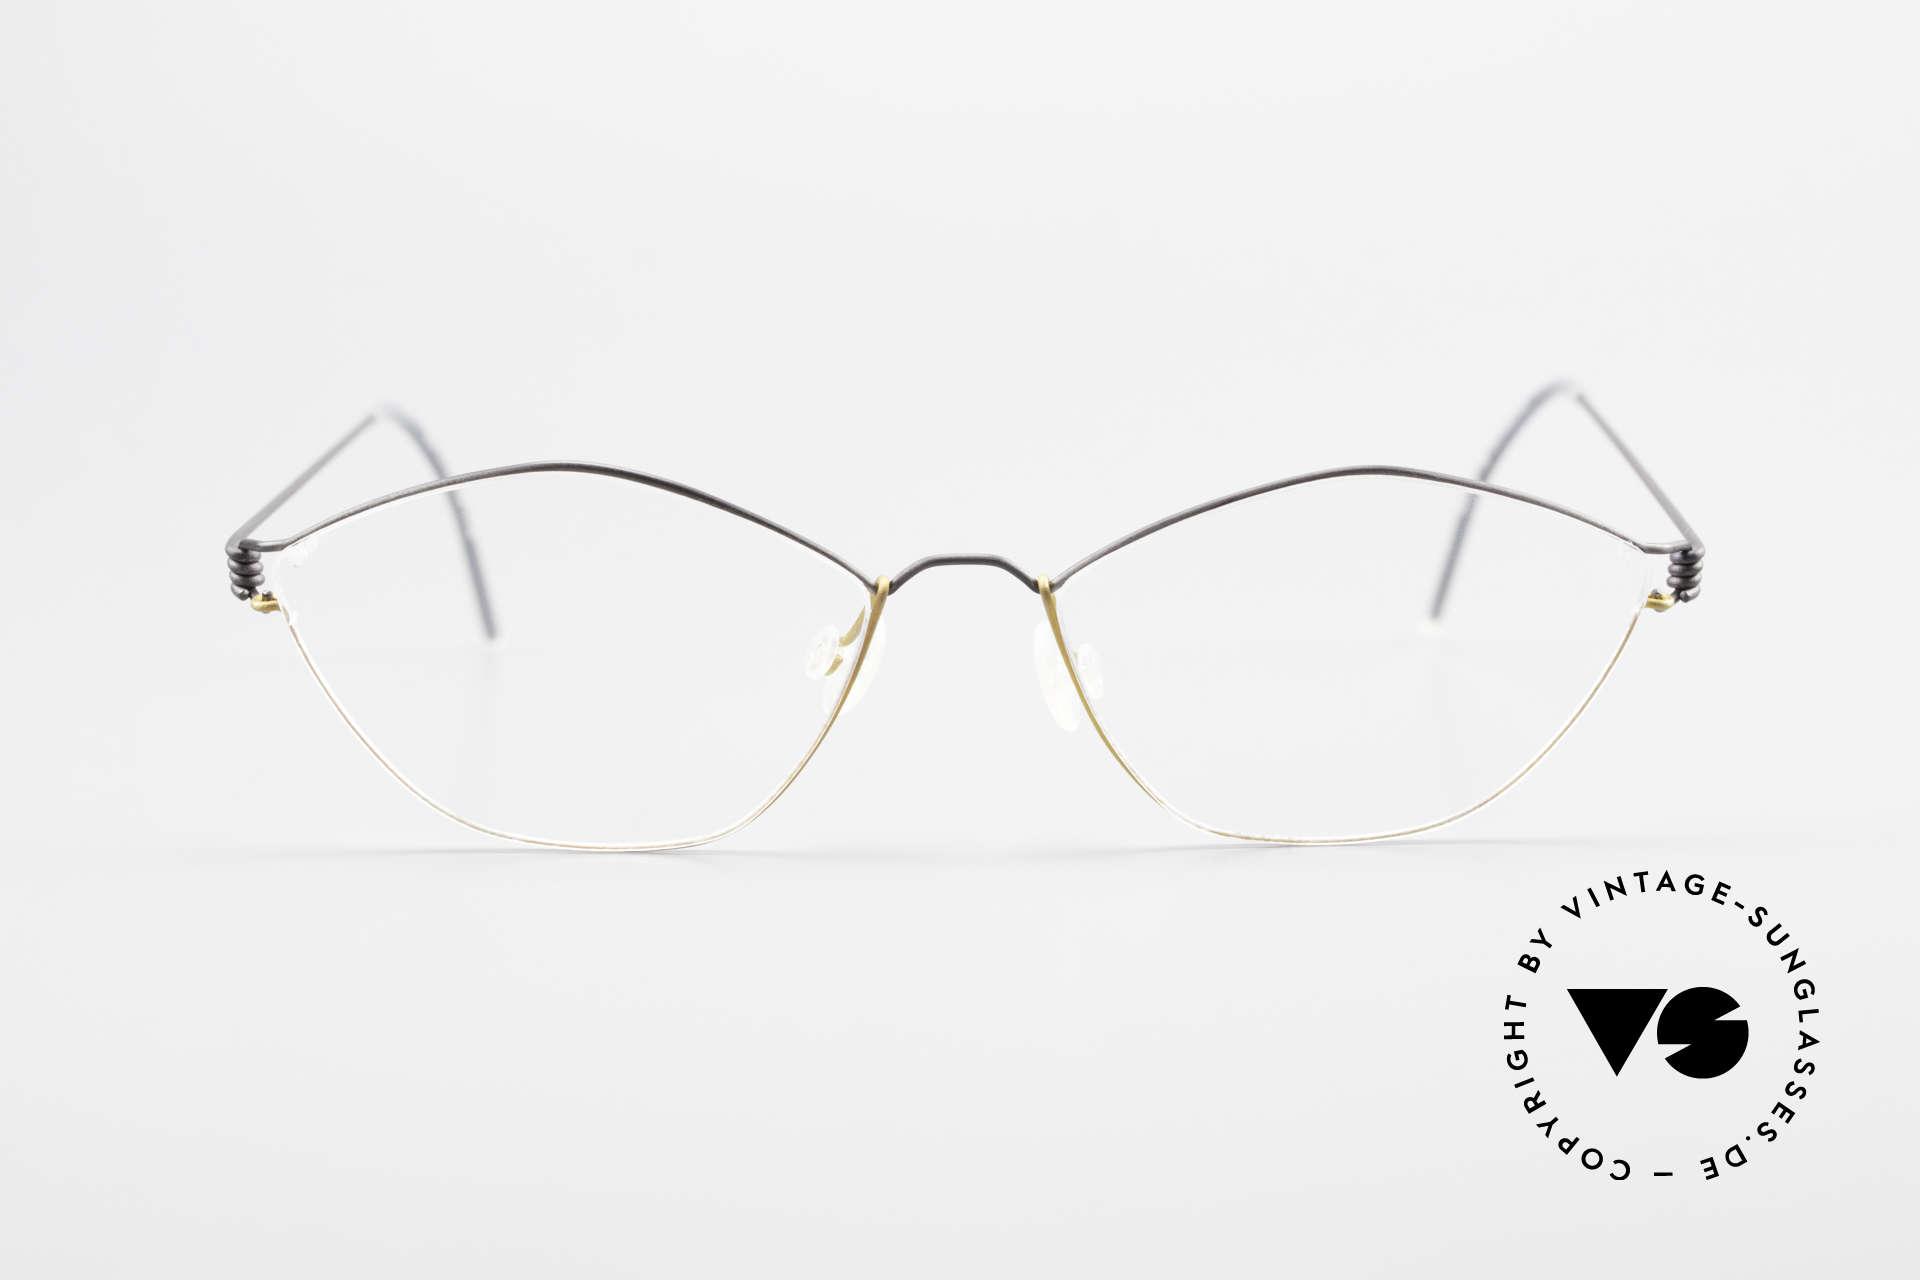 Lindberg Hydra Air Titan Rim Titanium Glasses For Ladies, distinctive quality and design (award-winning frame), Made for Women